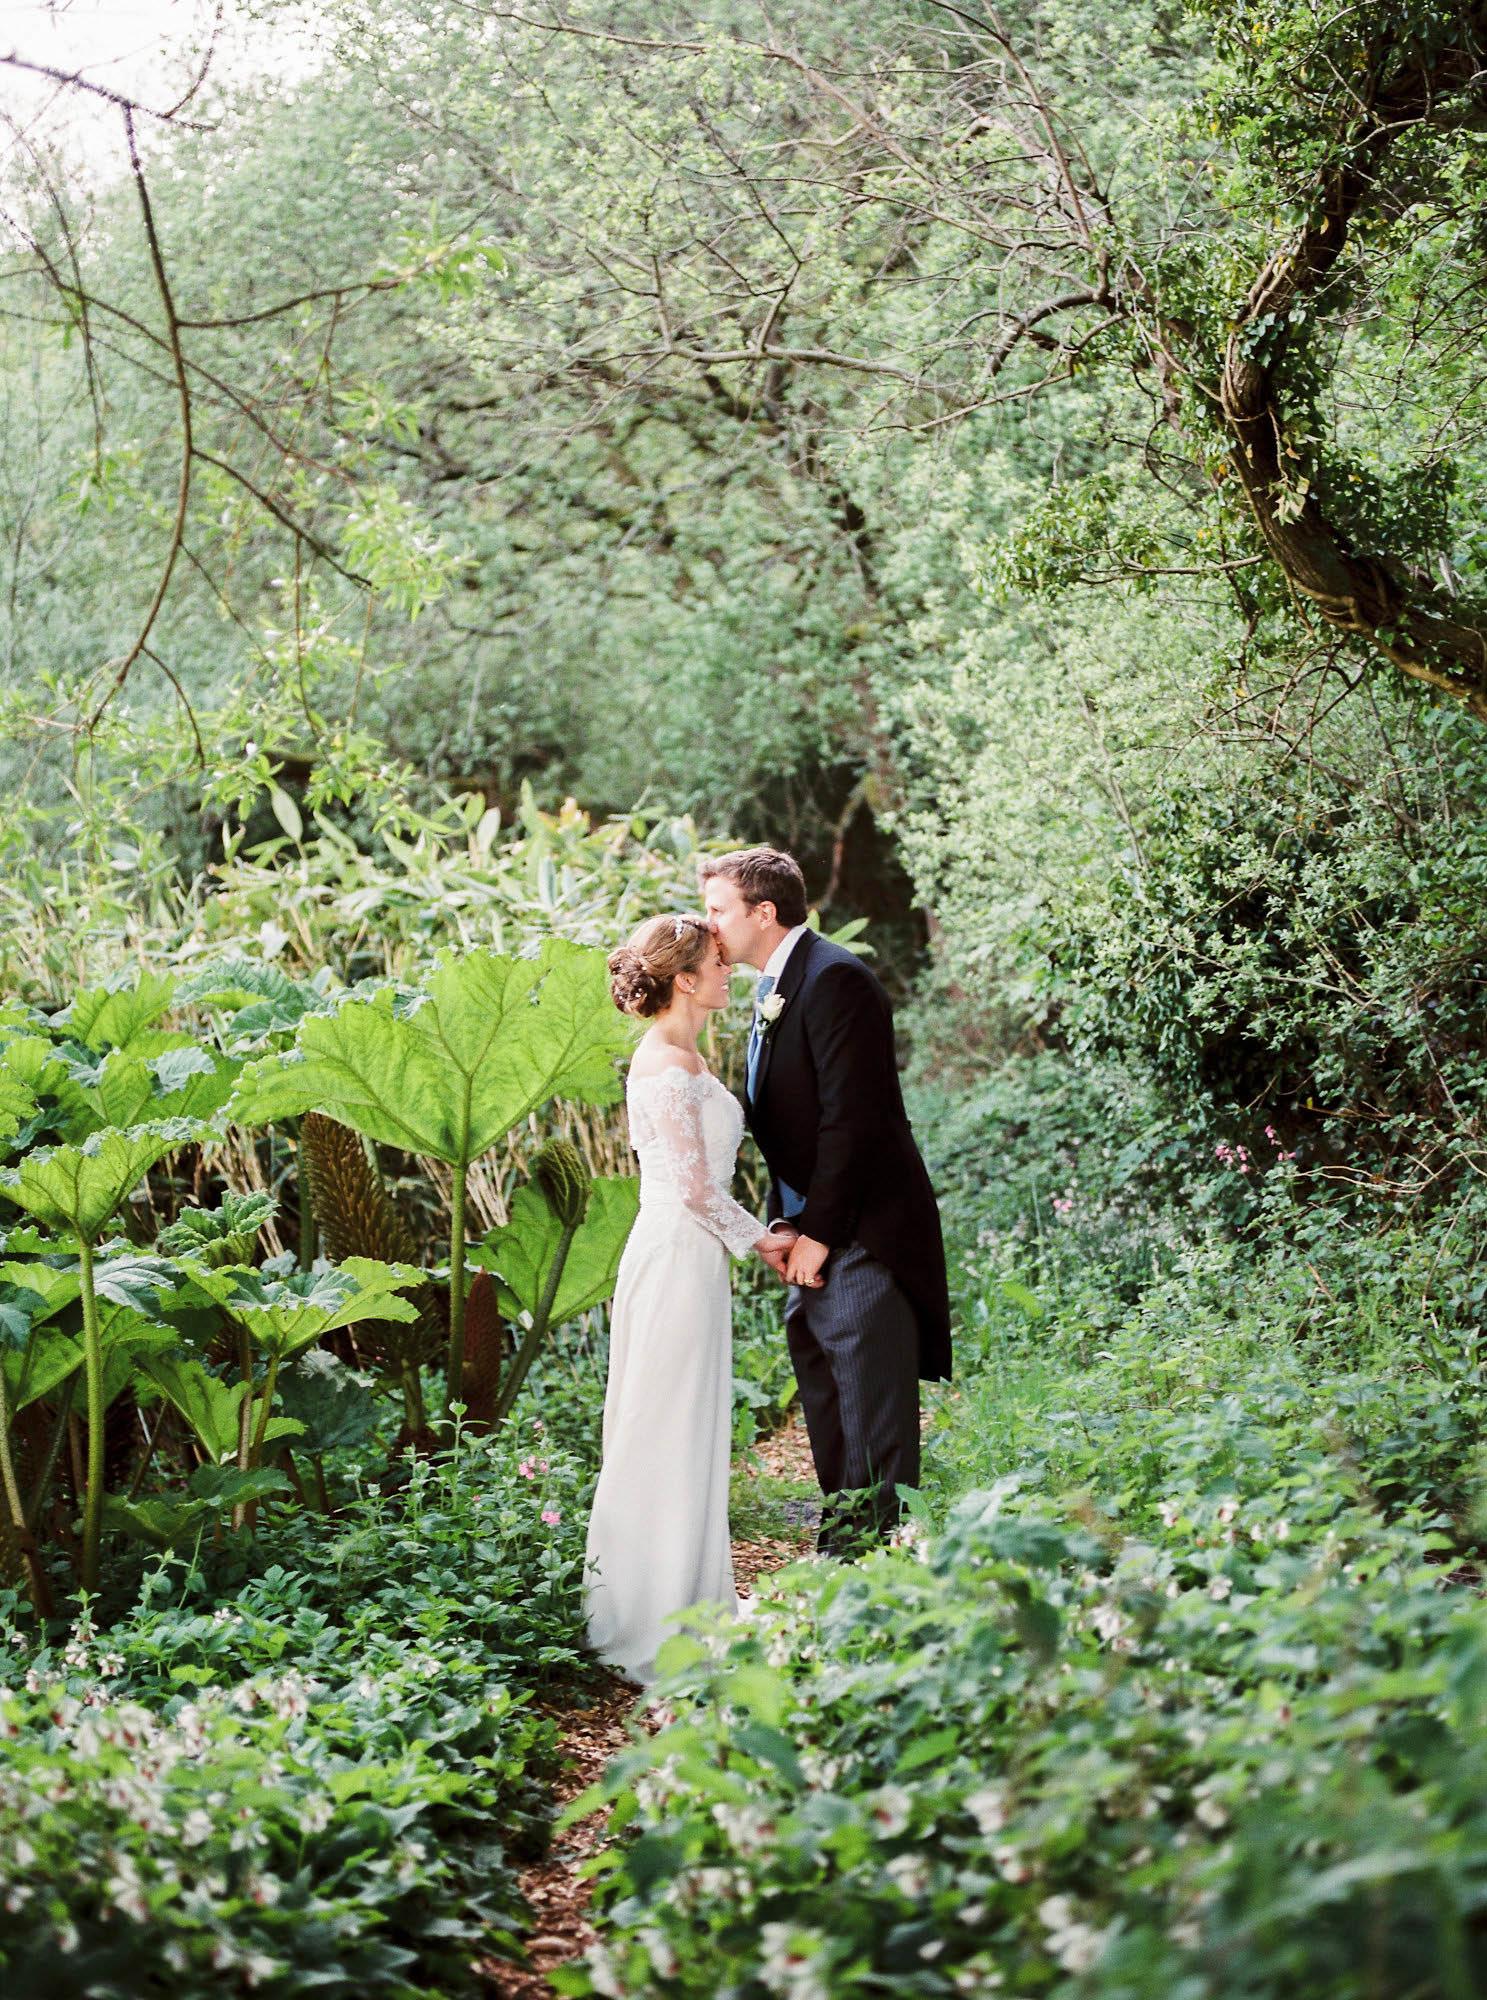 Amy O'Boyle Photography- Destination & UK Fine Art Film Wedding Photographer- English Countryside Wedding-13.jpg